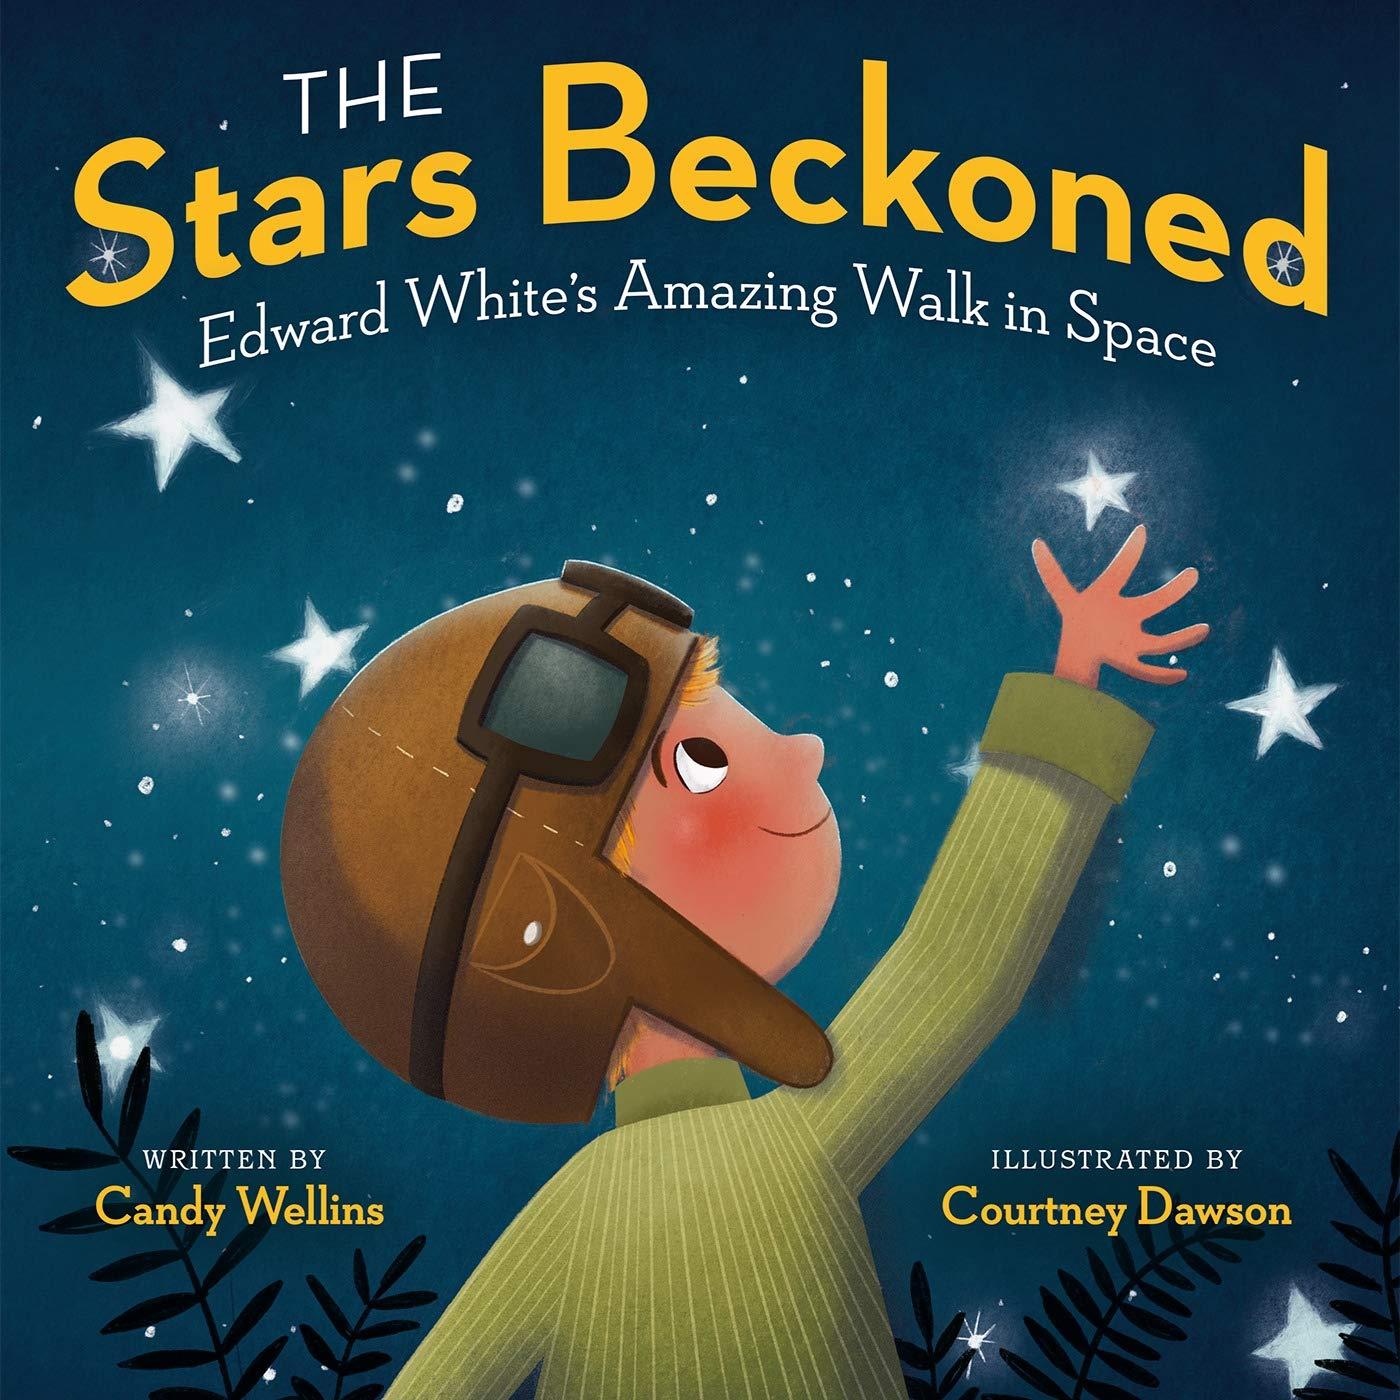 The Stars Beckoned: Edward White's Amazing Walk in Space: Wellins, Candy,  Dawson, Courtney: 9780593118047: Amazon.com: Books